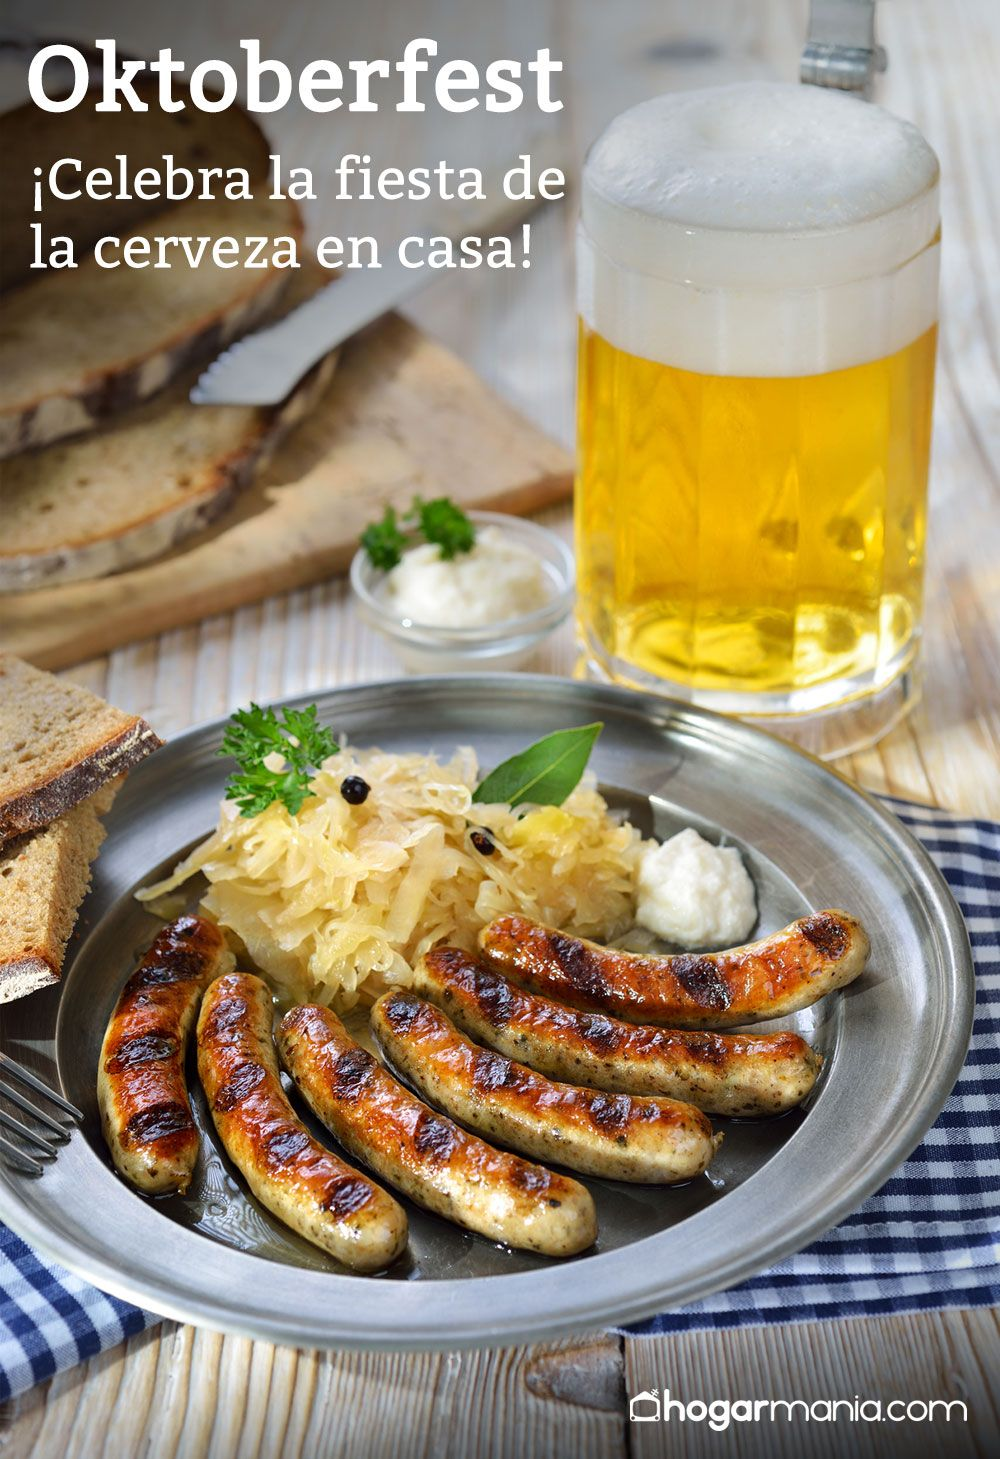 Oktoberfest, menú para celebrar la fiesta de la cerveza en casa